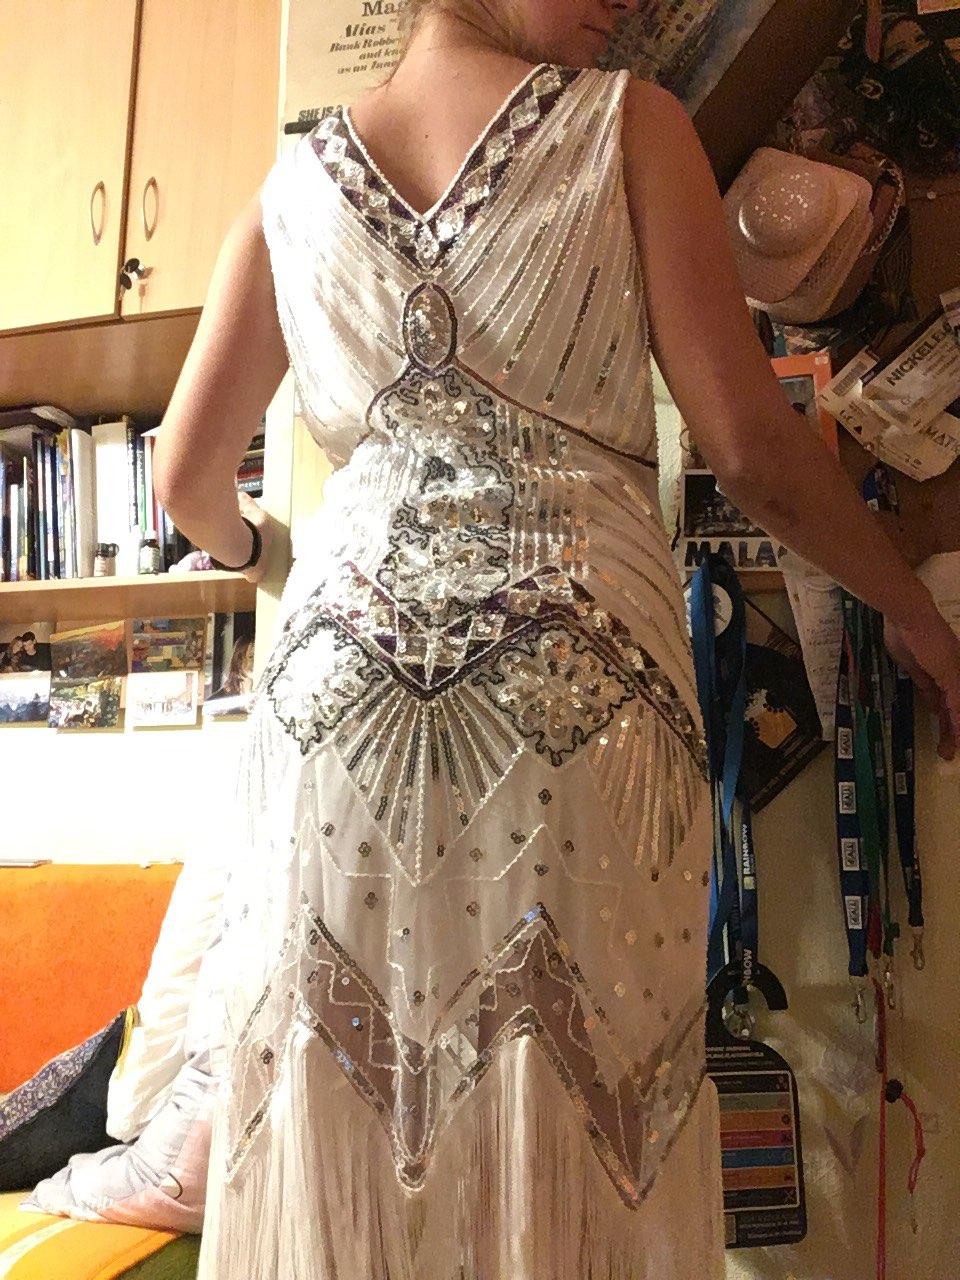 Women 1920 s Vintage Great Gatsby Dress Sequins Dress V-Neck Tassels Bodycon Beaded Party Dress Flapper Dresses Art Deco Double reviews №5 315597